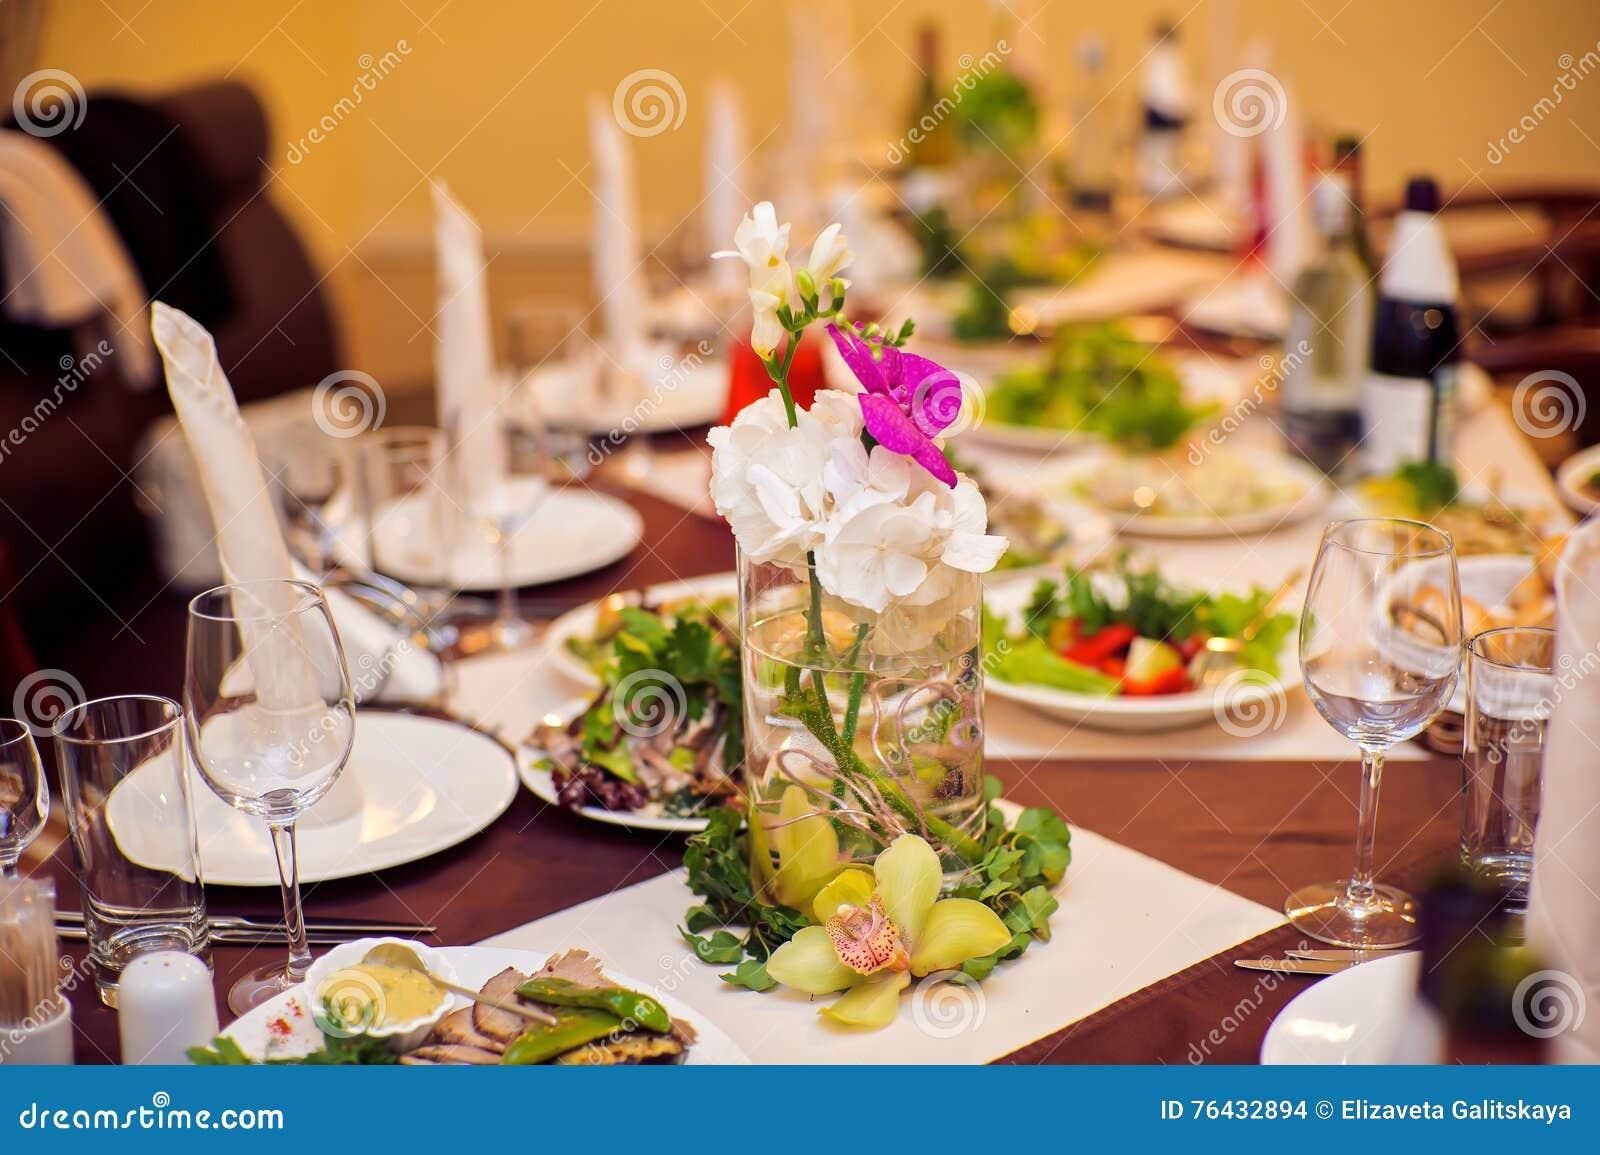 Dinner table with food - Dinner Food Restaurant Table